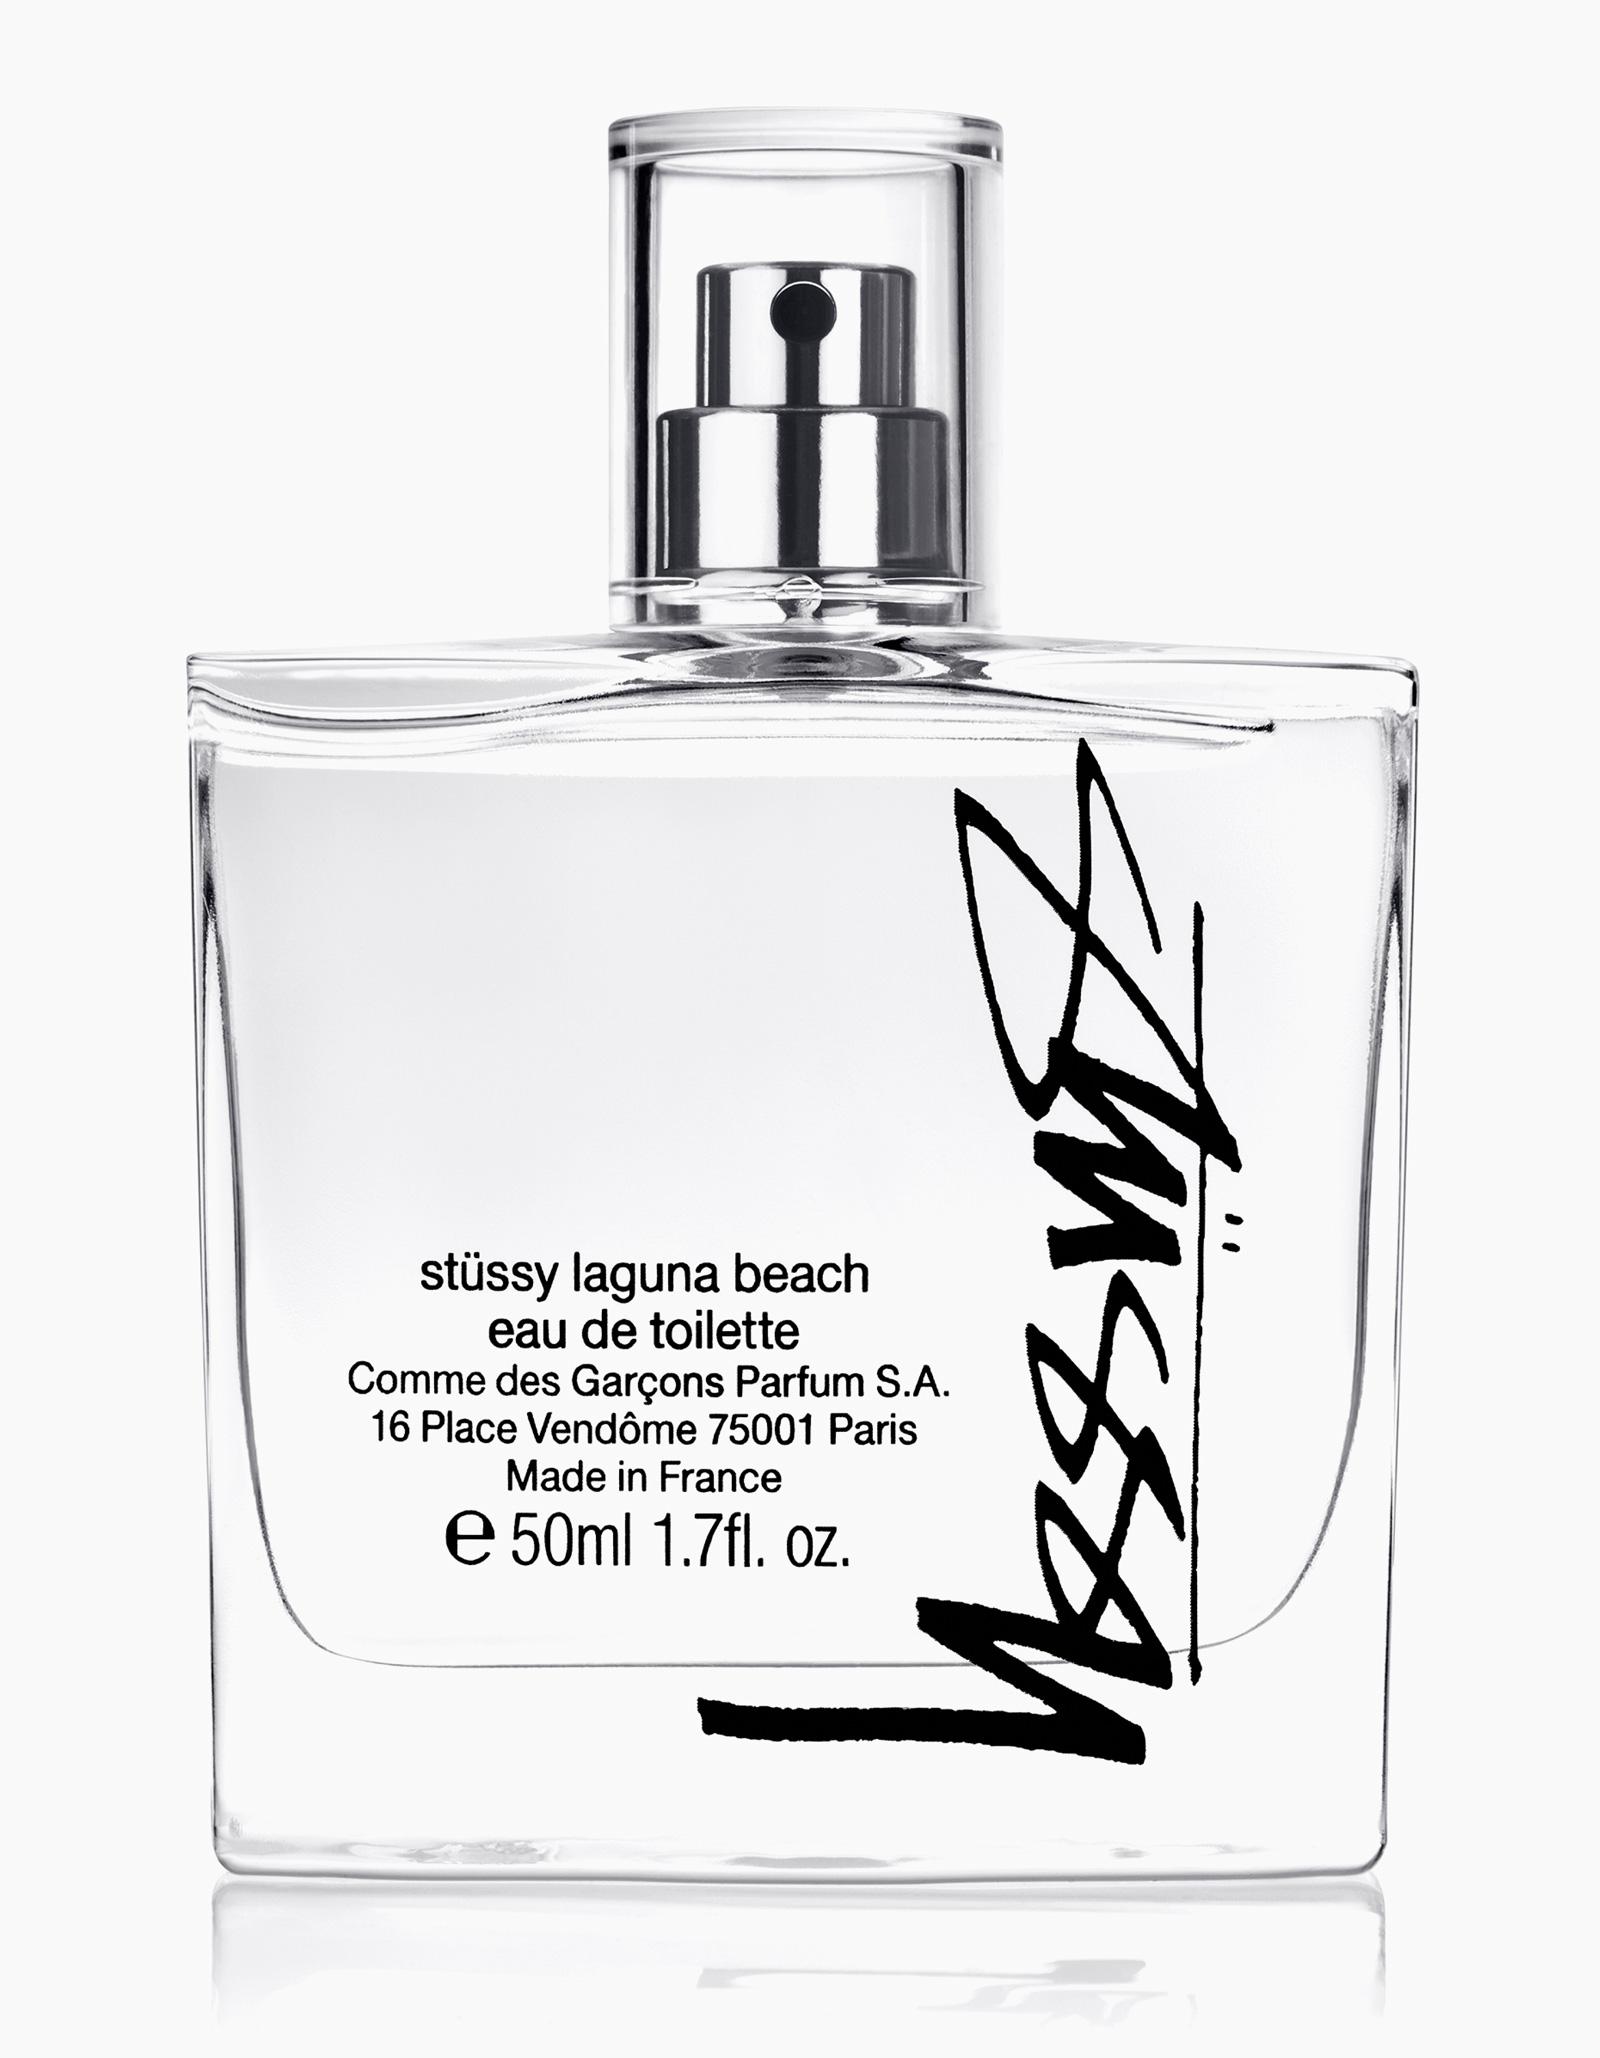 Stussy CDG Parfums - Laguna Beach Scent - 4.jpg